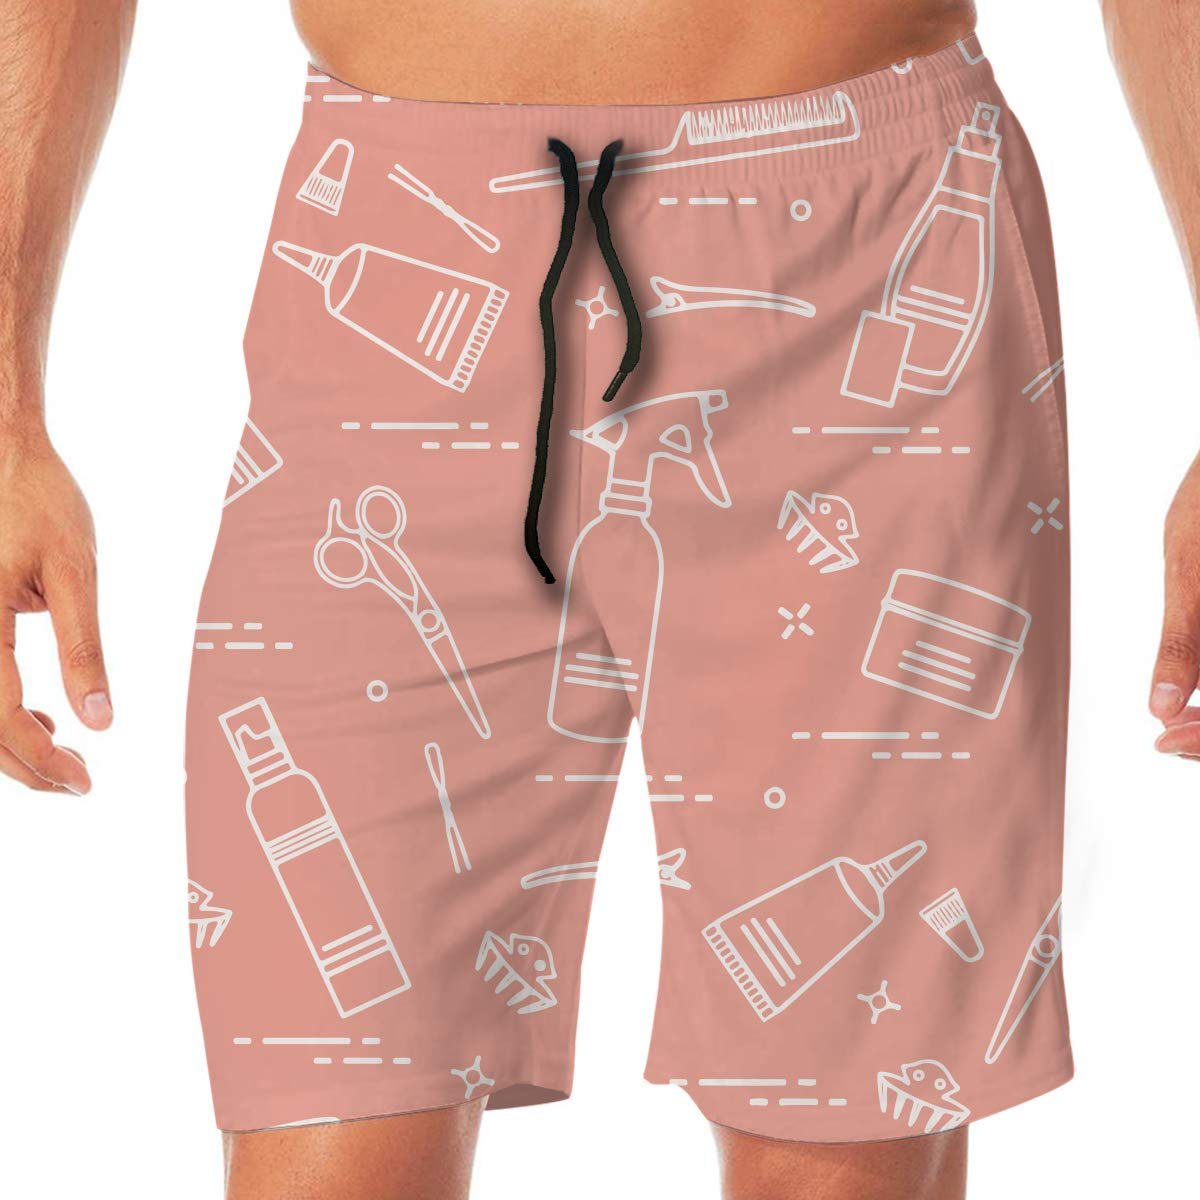 BEAQ45 Hairdressing Service Beach Shorts Mens Summer Quick Dry Printing Boardshort